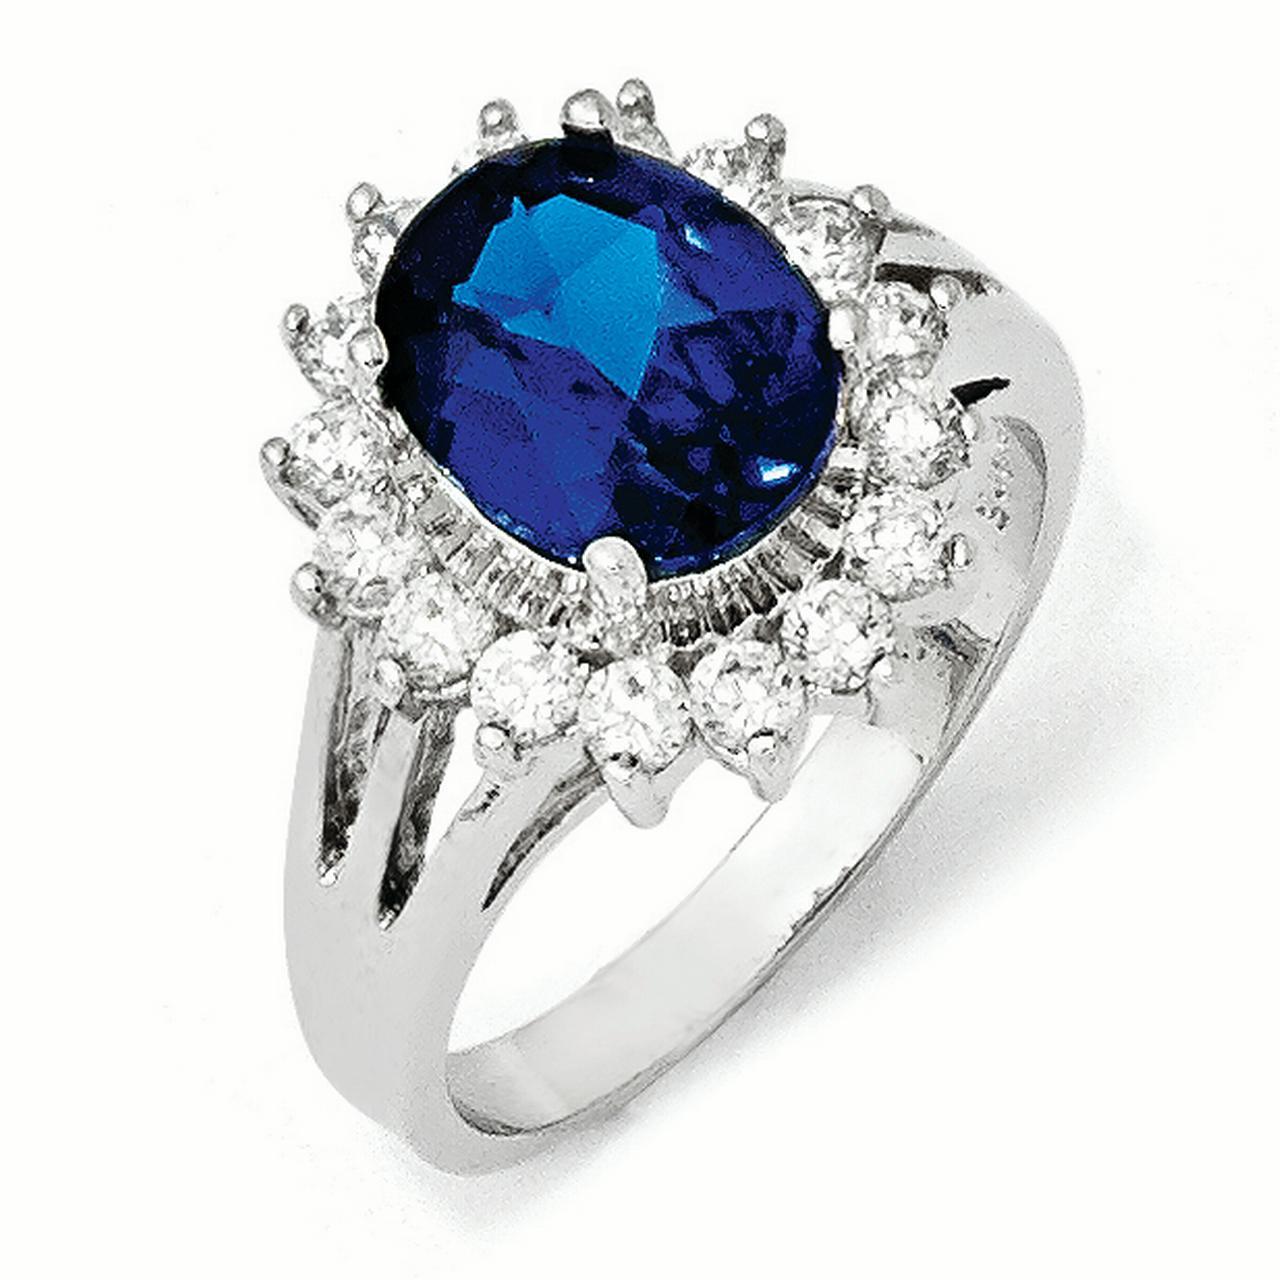 Cheryl M Sterling Silver CZ & Lab created Dark Blue Spinel Ring Size 6 - image 3 de 3